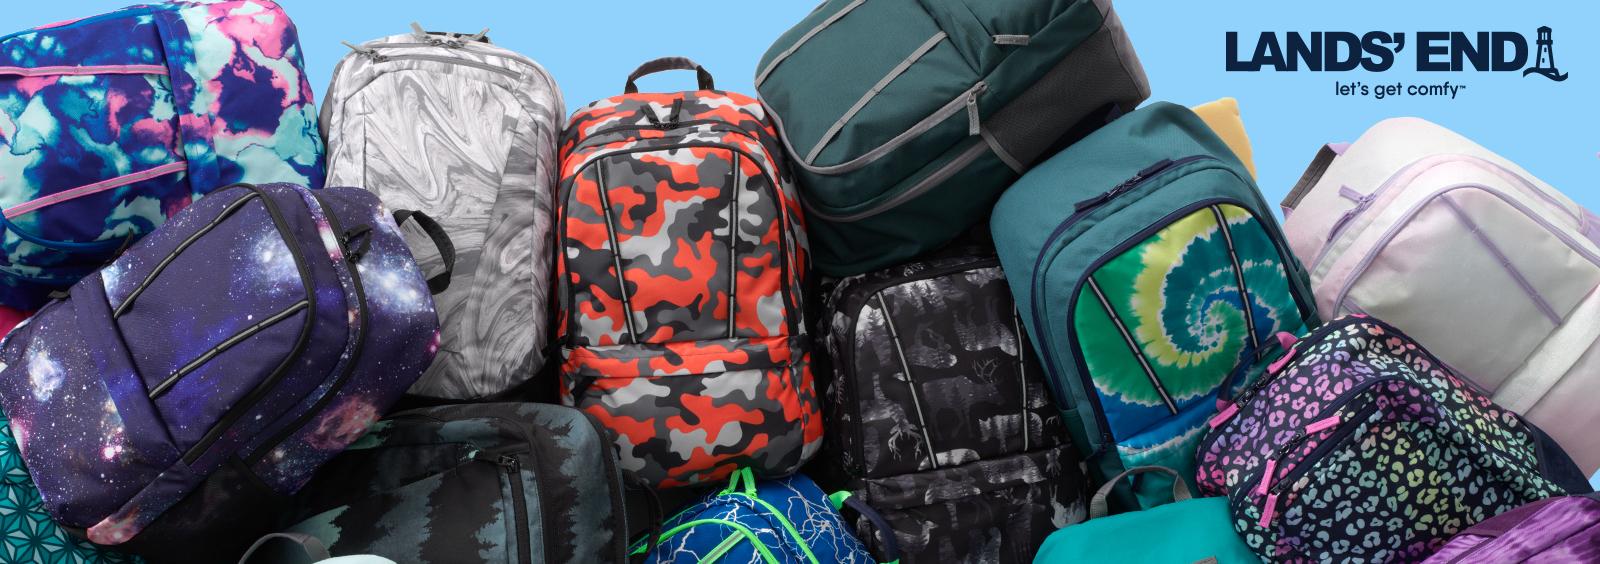 Why Backpacks Make the Best Sleepover Bags